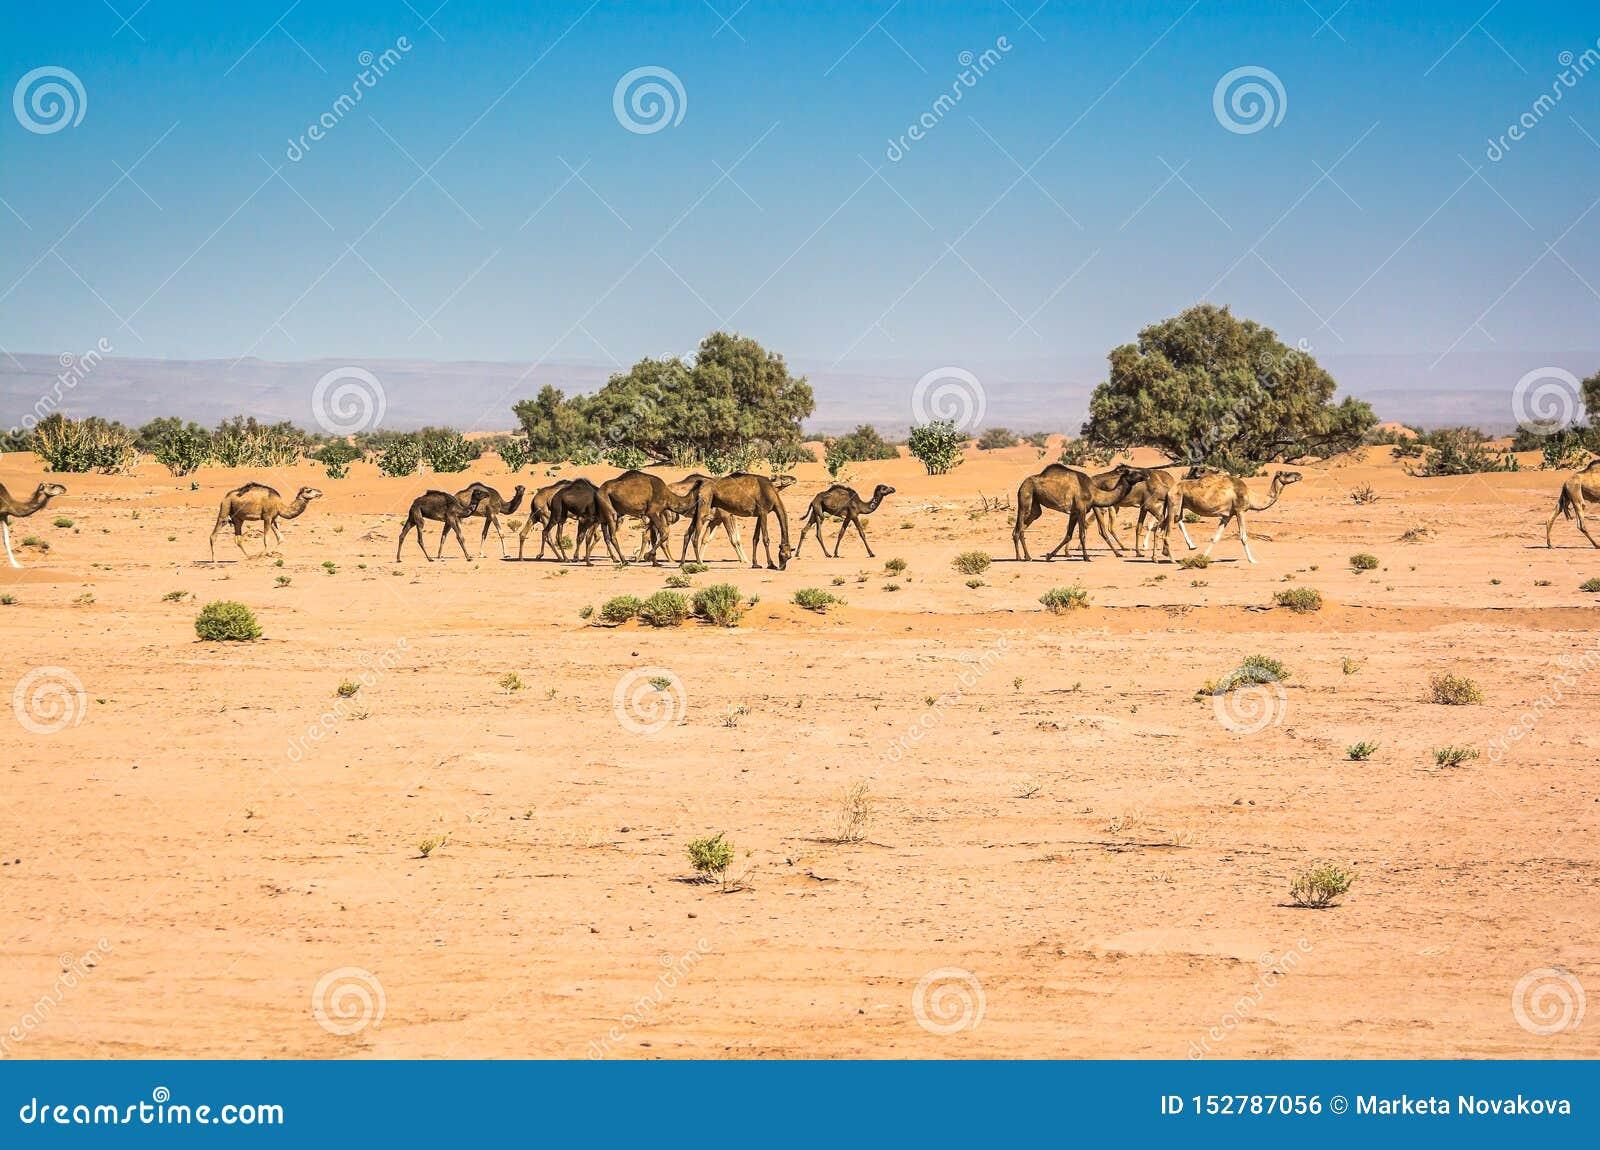 Wild camels in desert Sahara in Erg Chigaga, Morocco